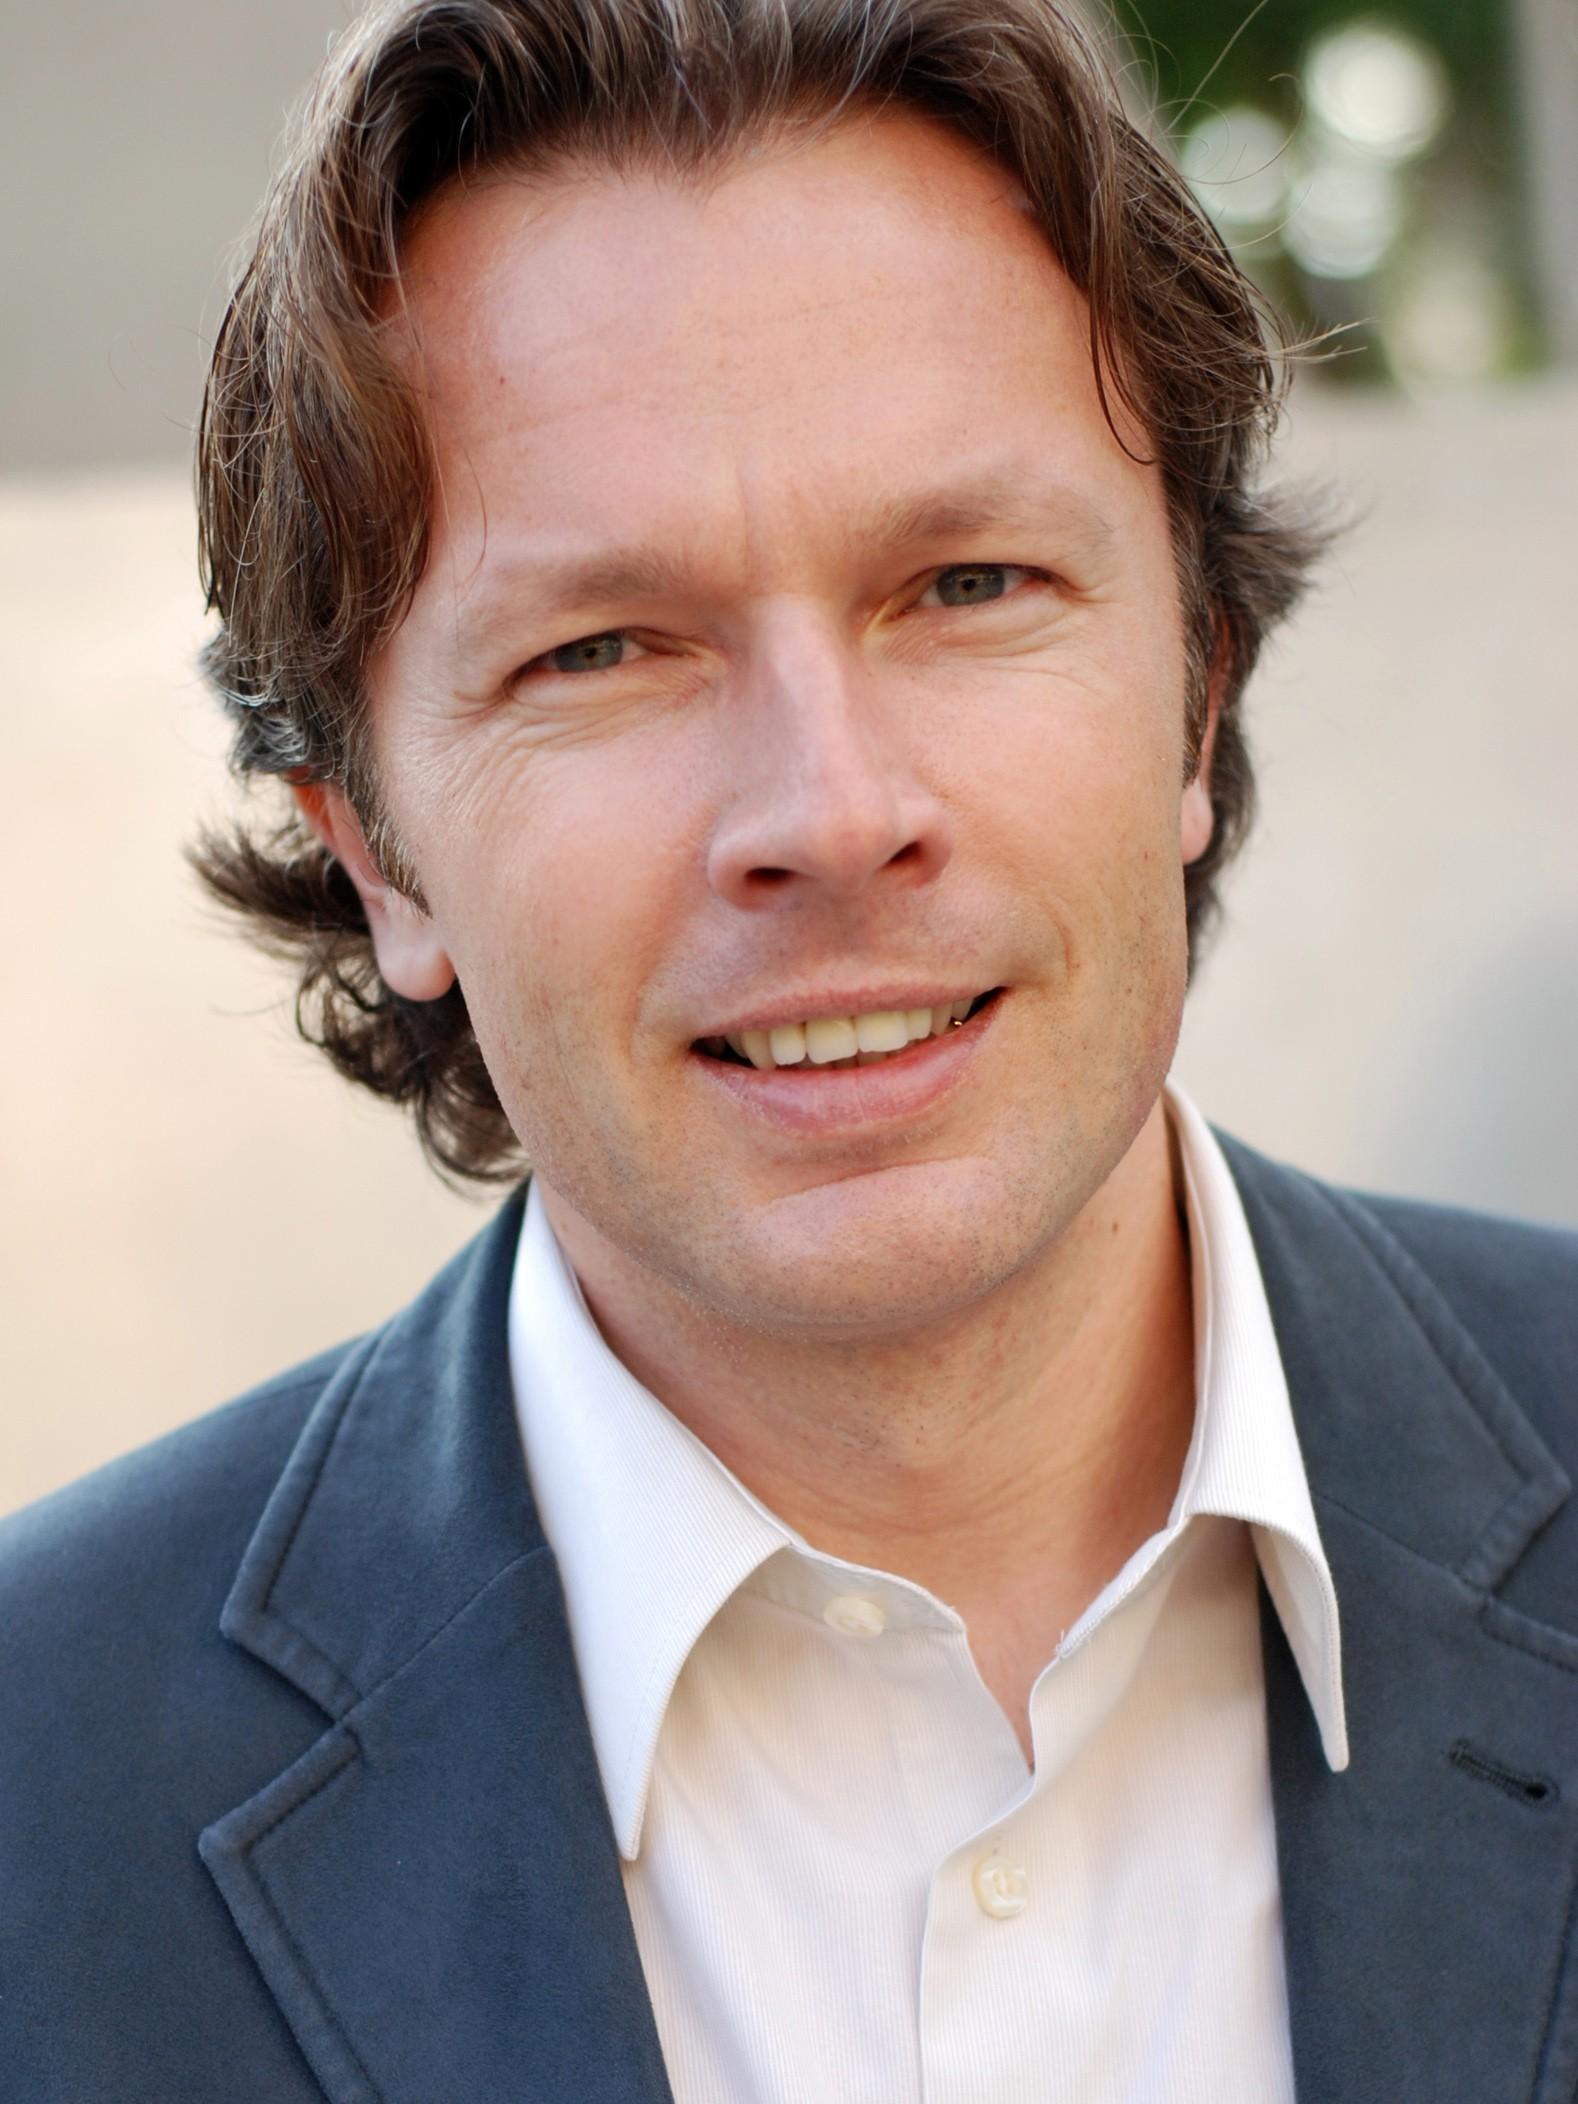 Prof. DDr. Arno Scharl